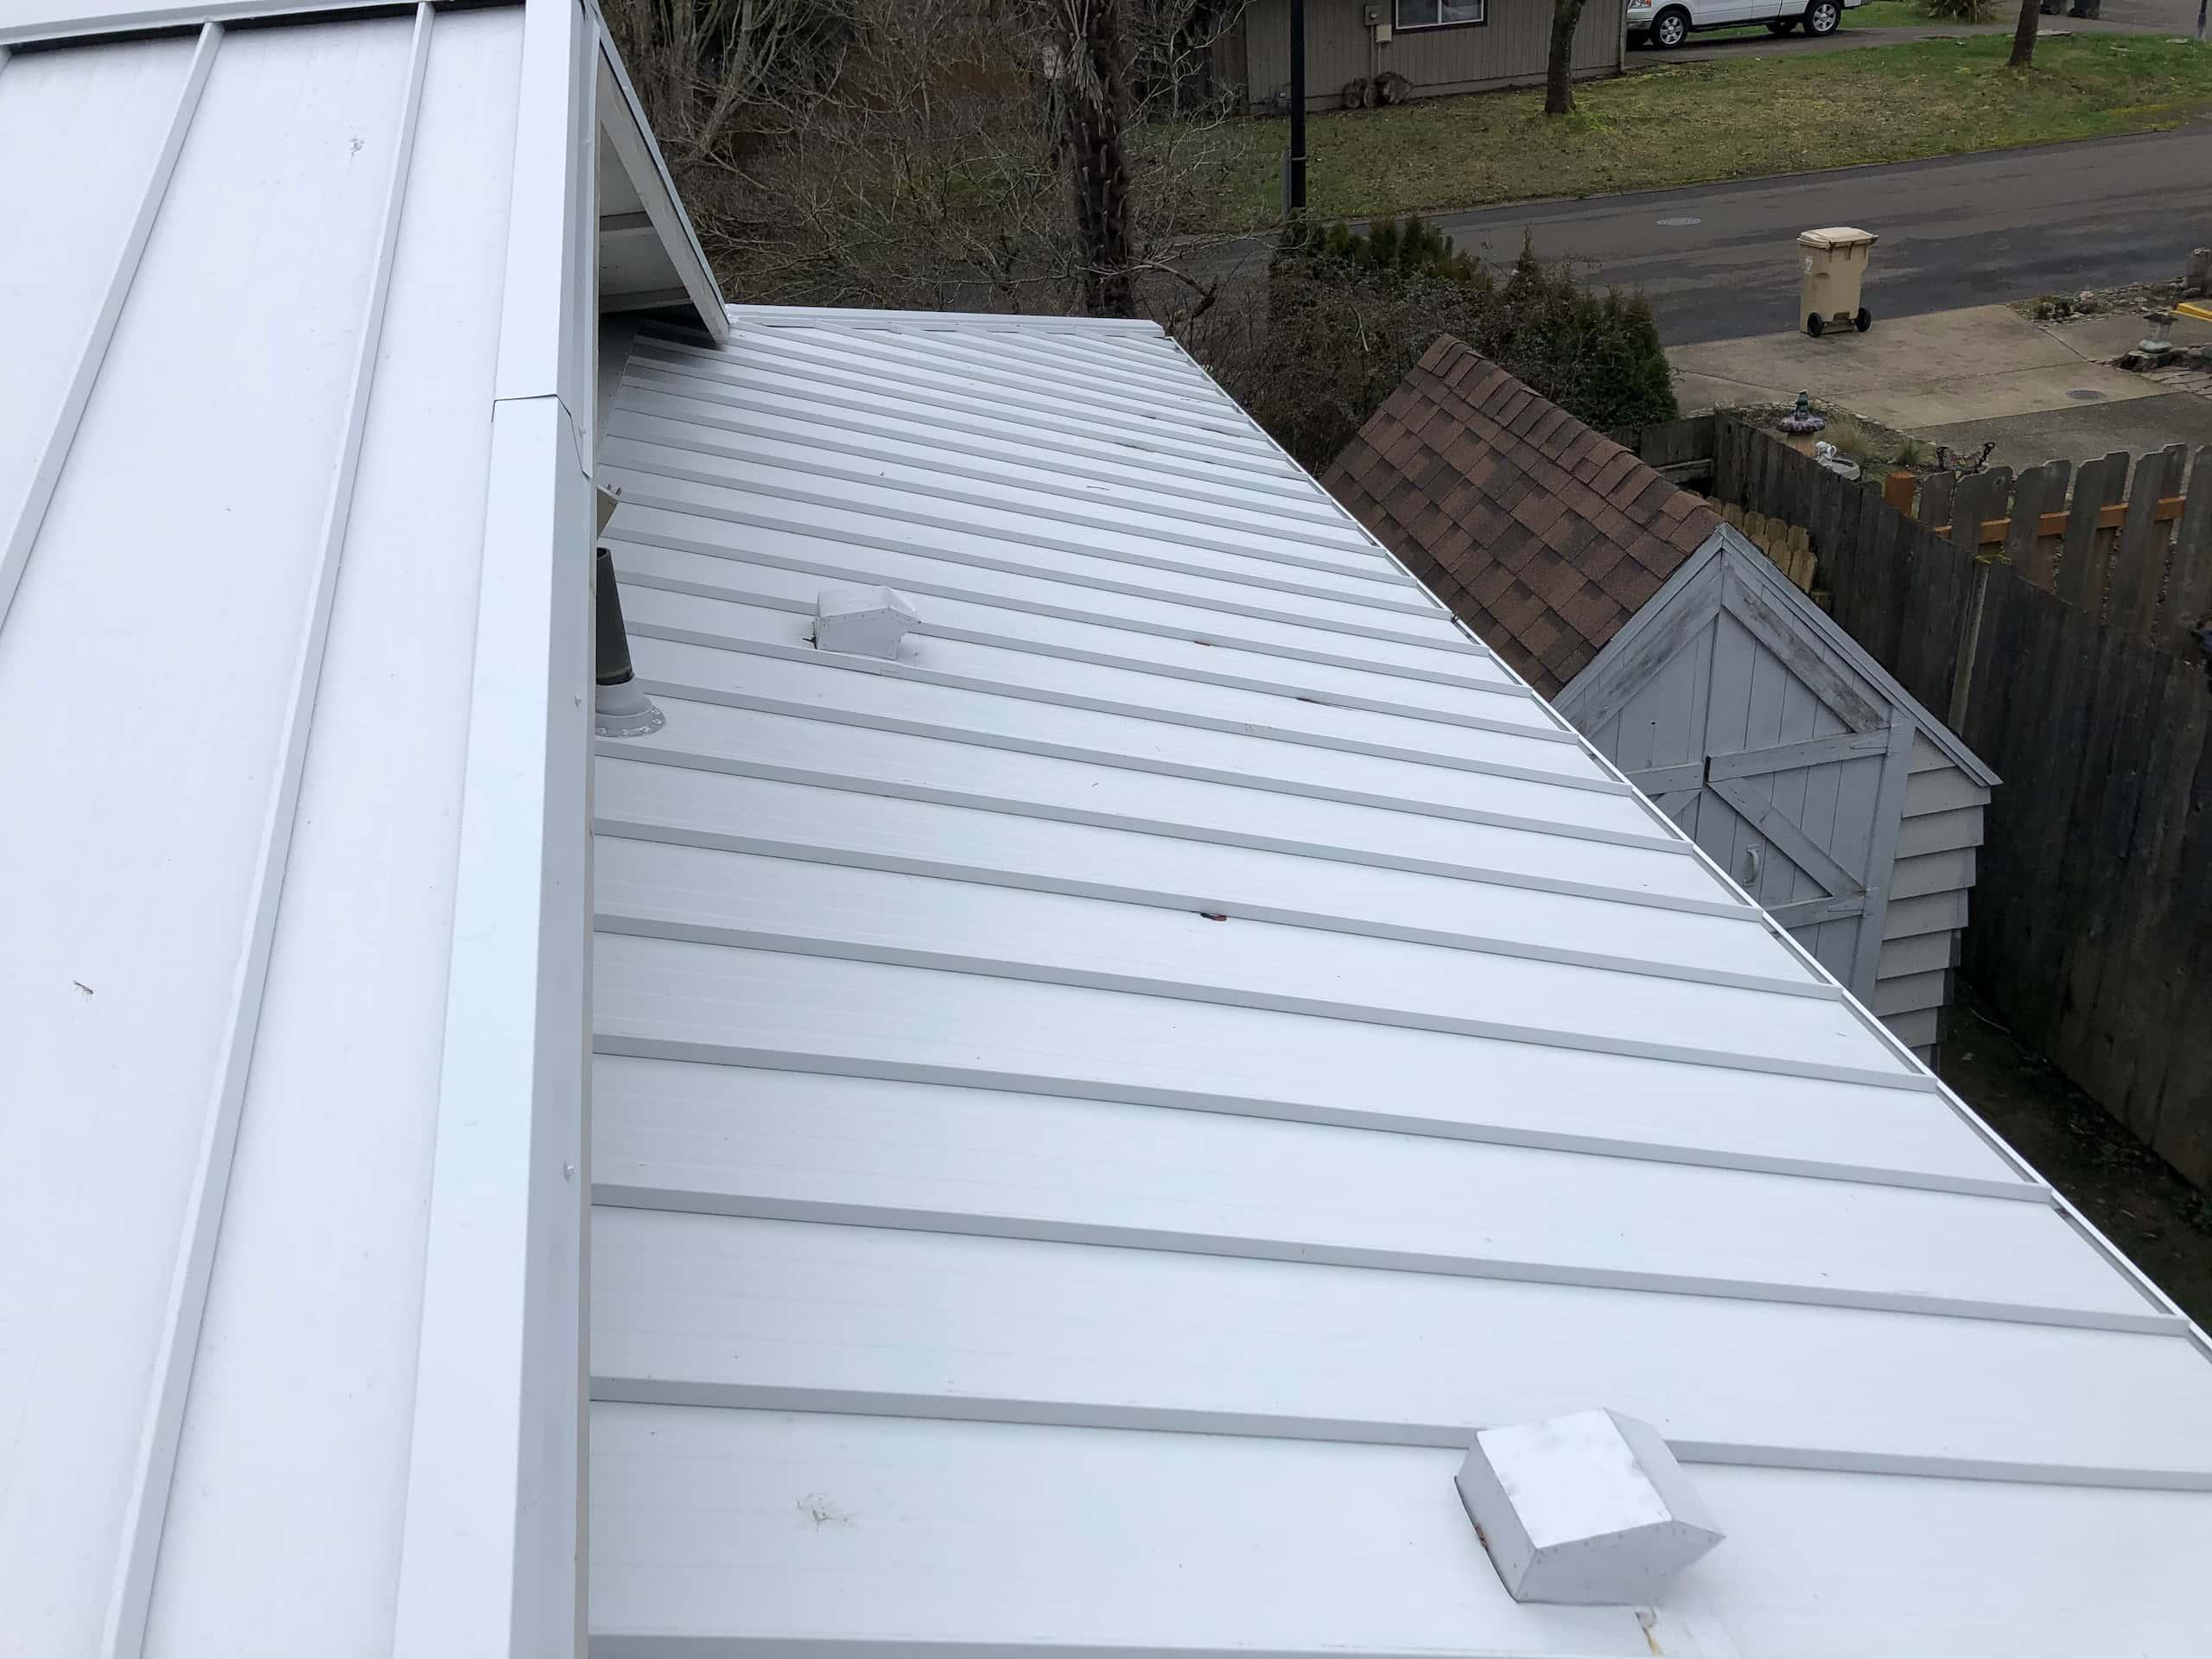 Reliance Roof Pros LLC | Beaverton | New Roof | Taylor Metal 24 Gauge Kynar | Glacier White | Dormer